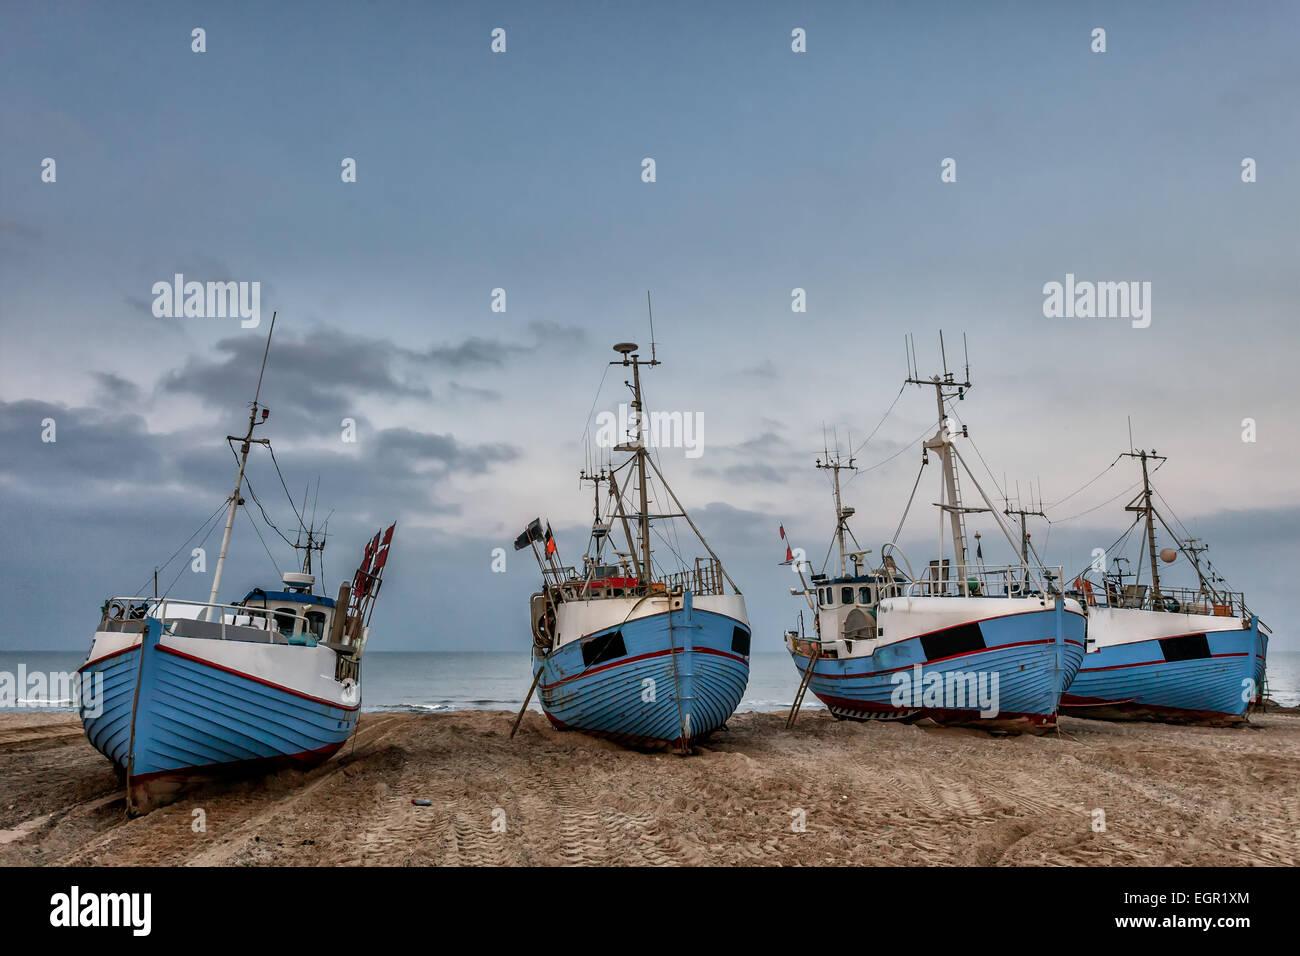 Fishing boats on land at Thorup beach on the Danish North Sea coast - Stock Image